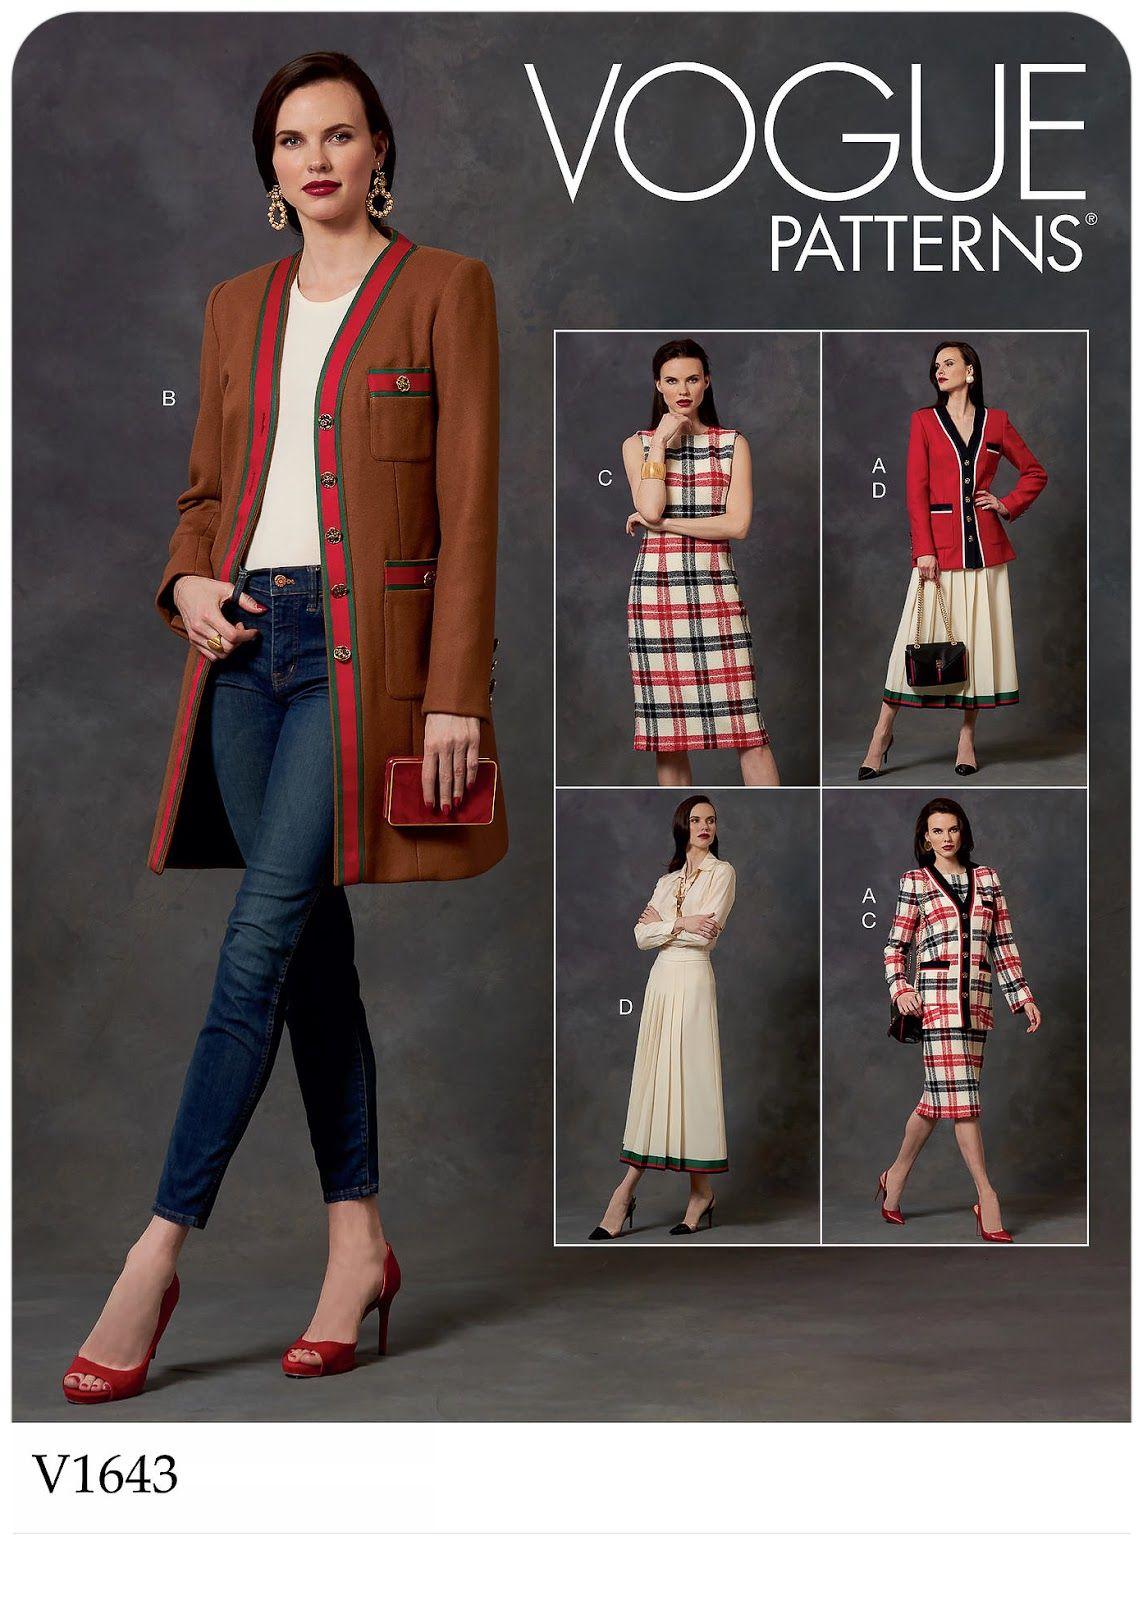 Vogue Patterns 1643 V1643 Vogue Patterns Skirt Patterns